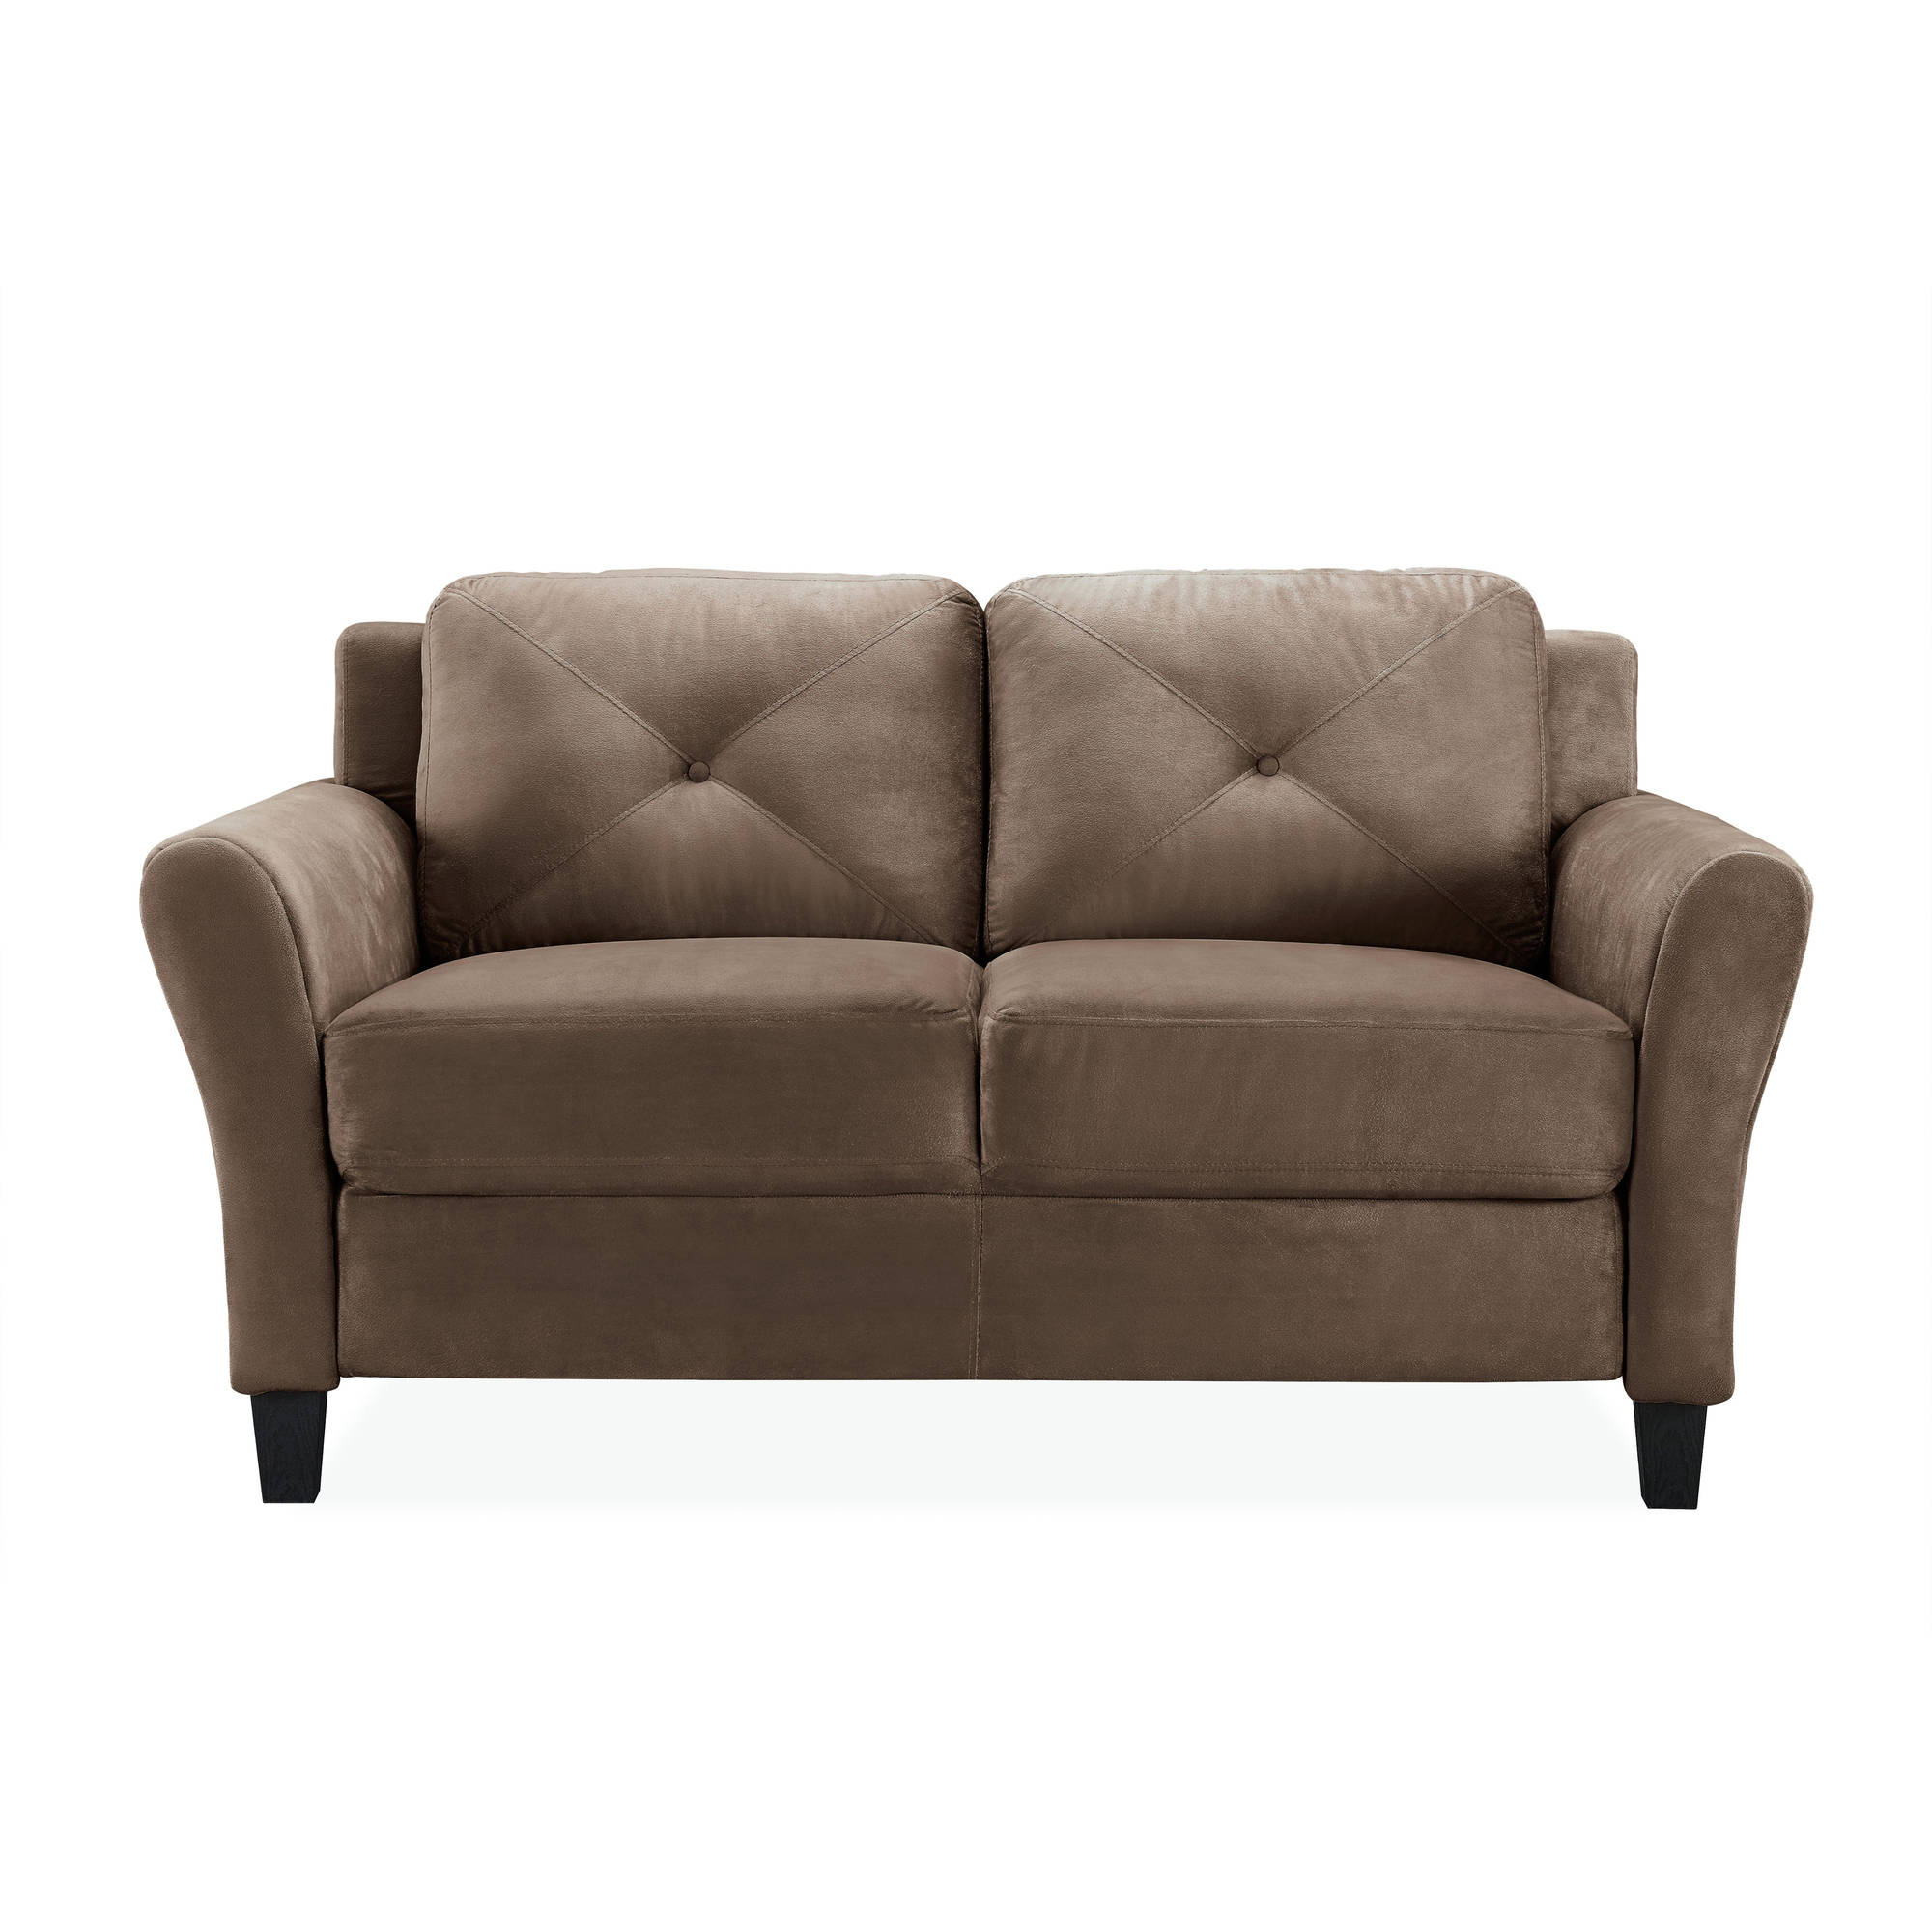 leather kicaz loveseat baby shower chair kdegussem rental rentals